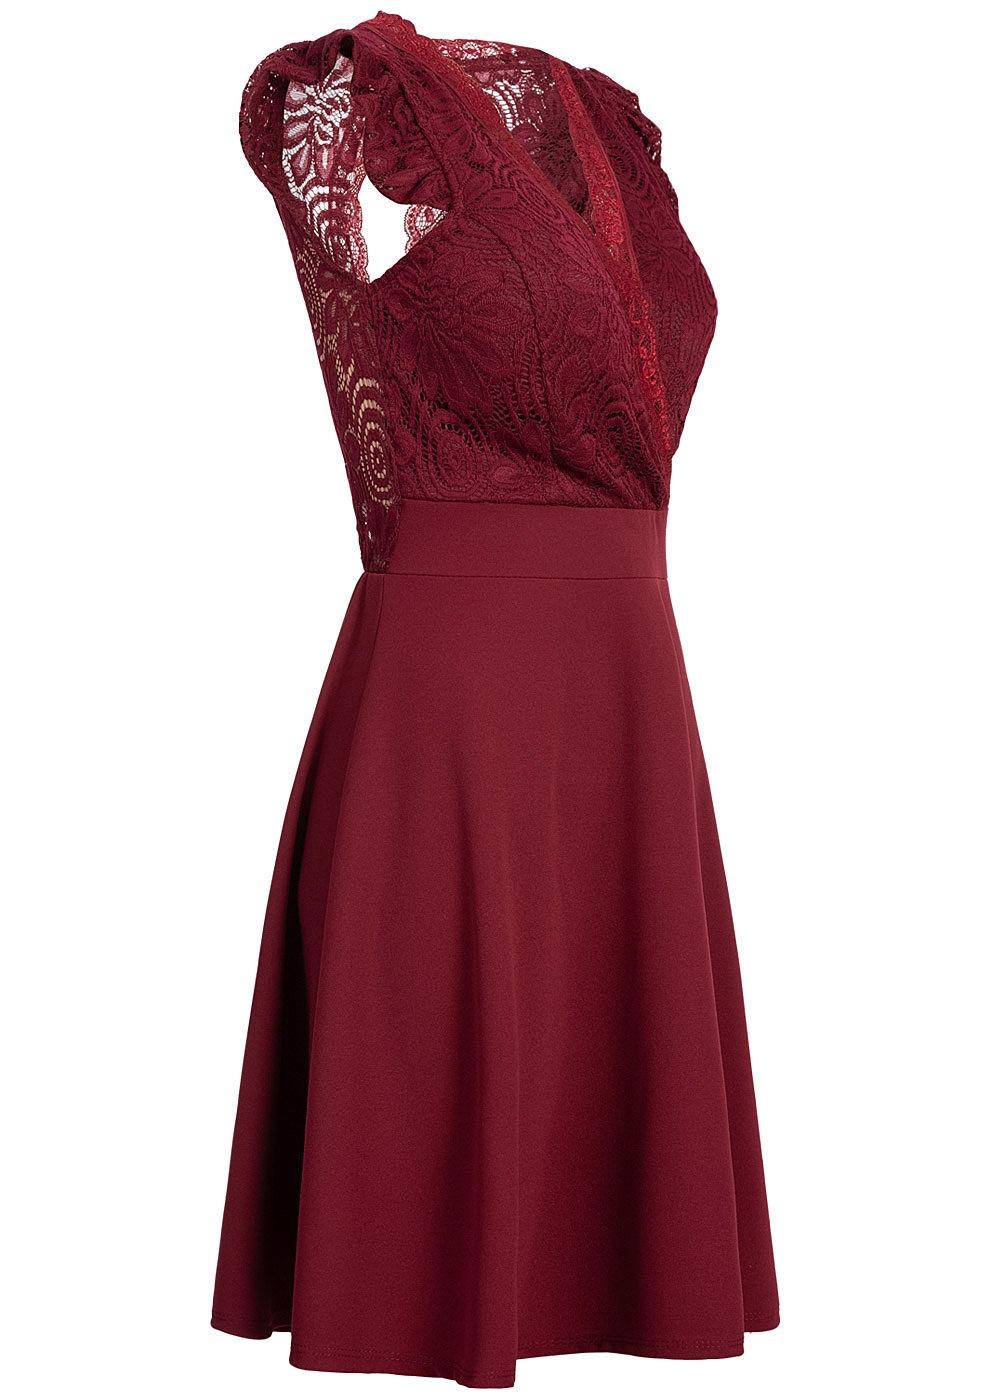 Styleboom Fashion Damen Mini Kleid Spitzen Details Brustpads bordeaux rot